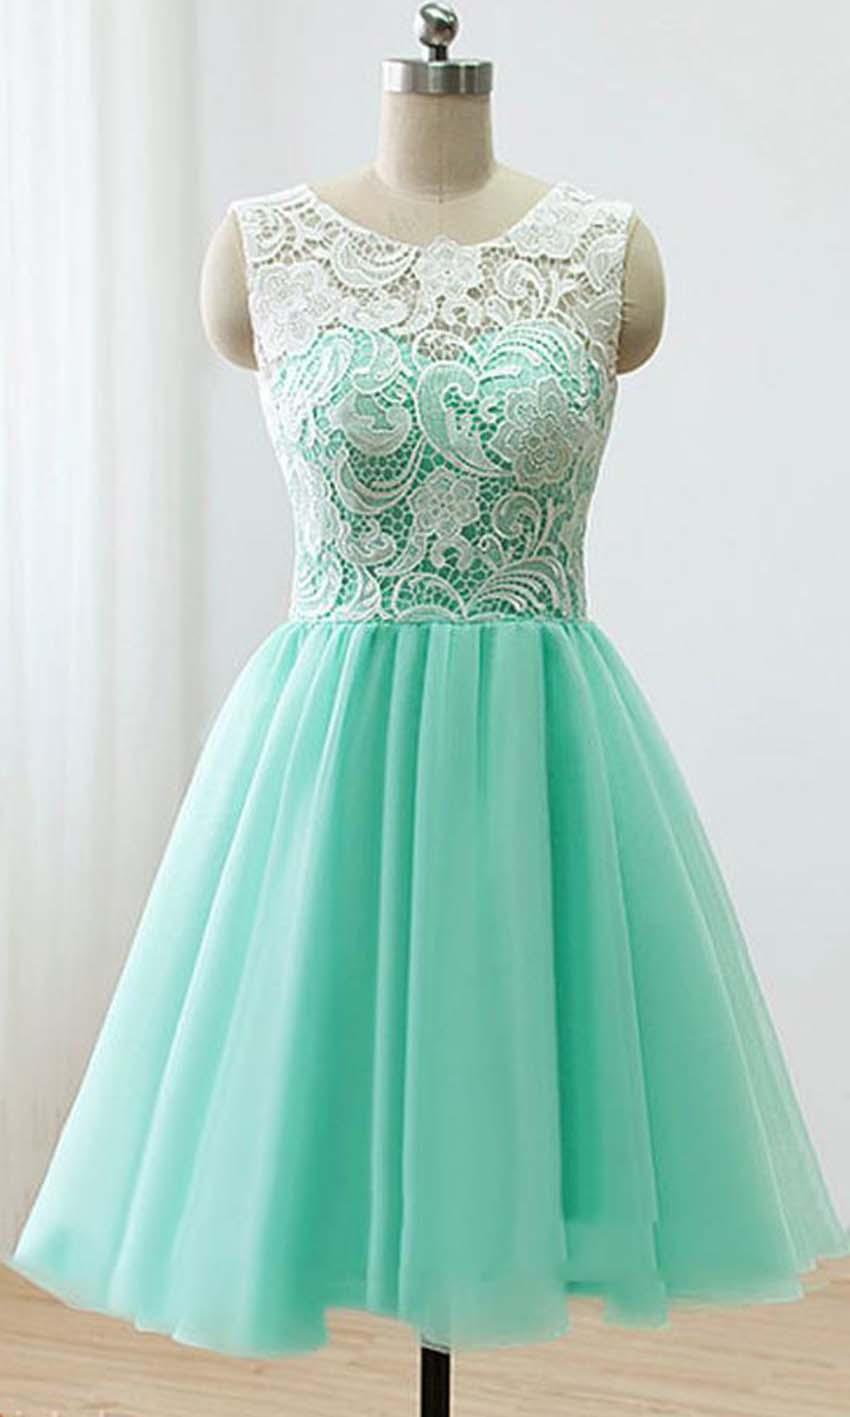 White Prom Dresses Cheap Uk 42